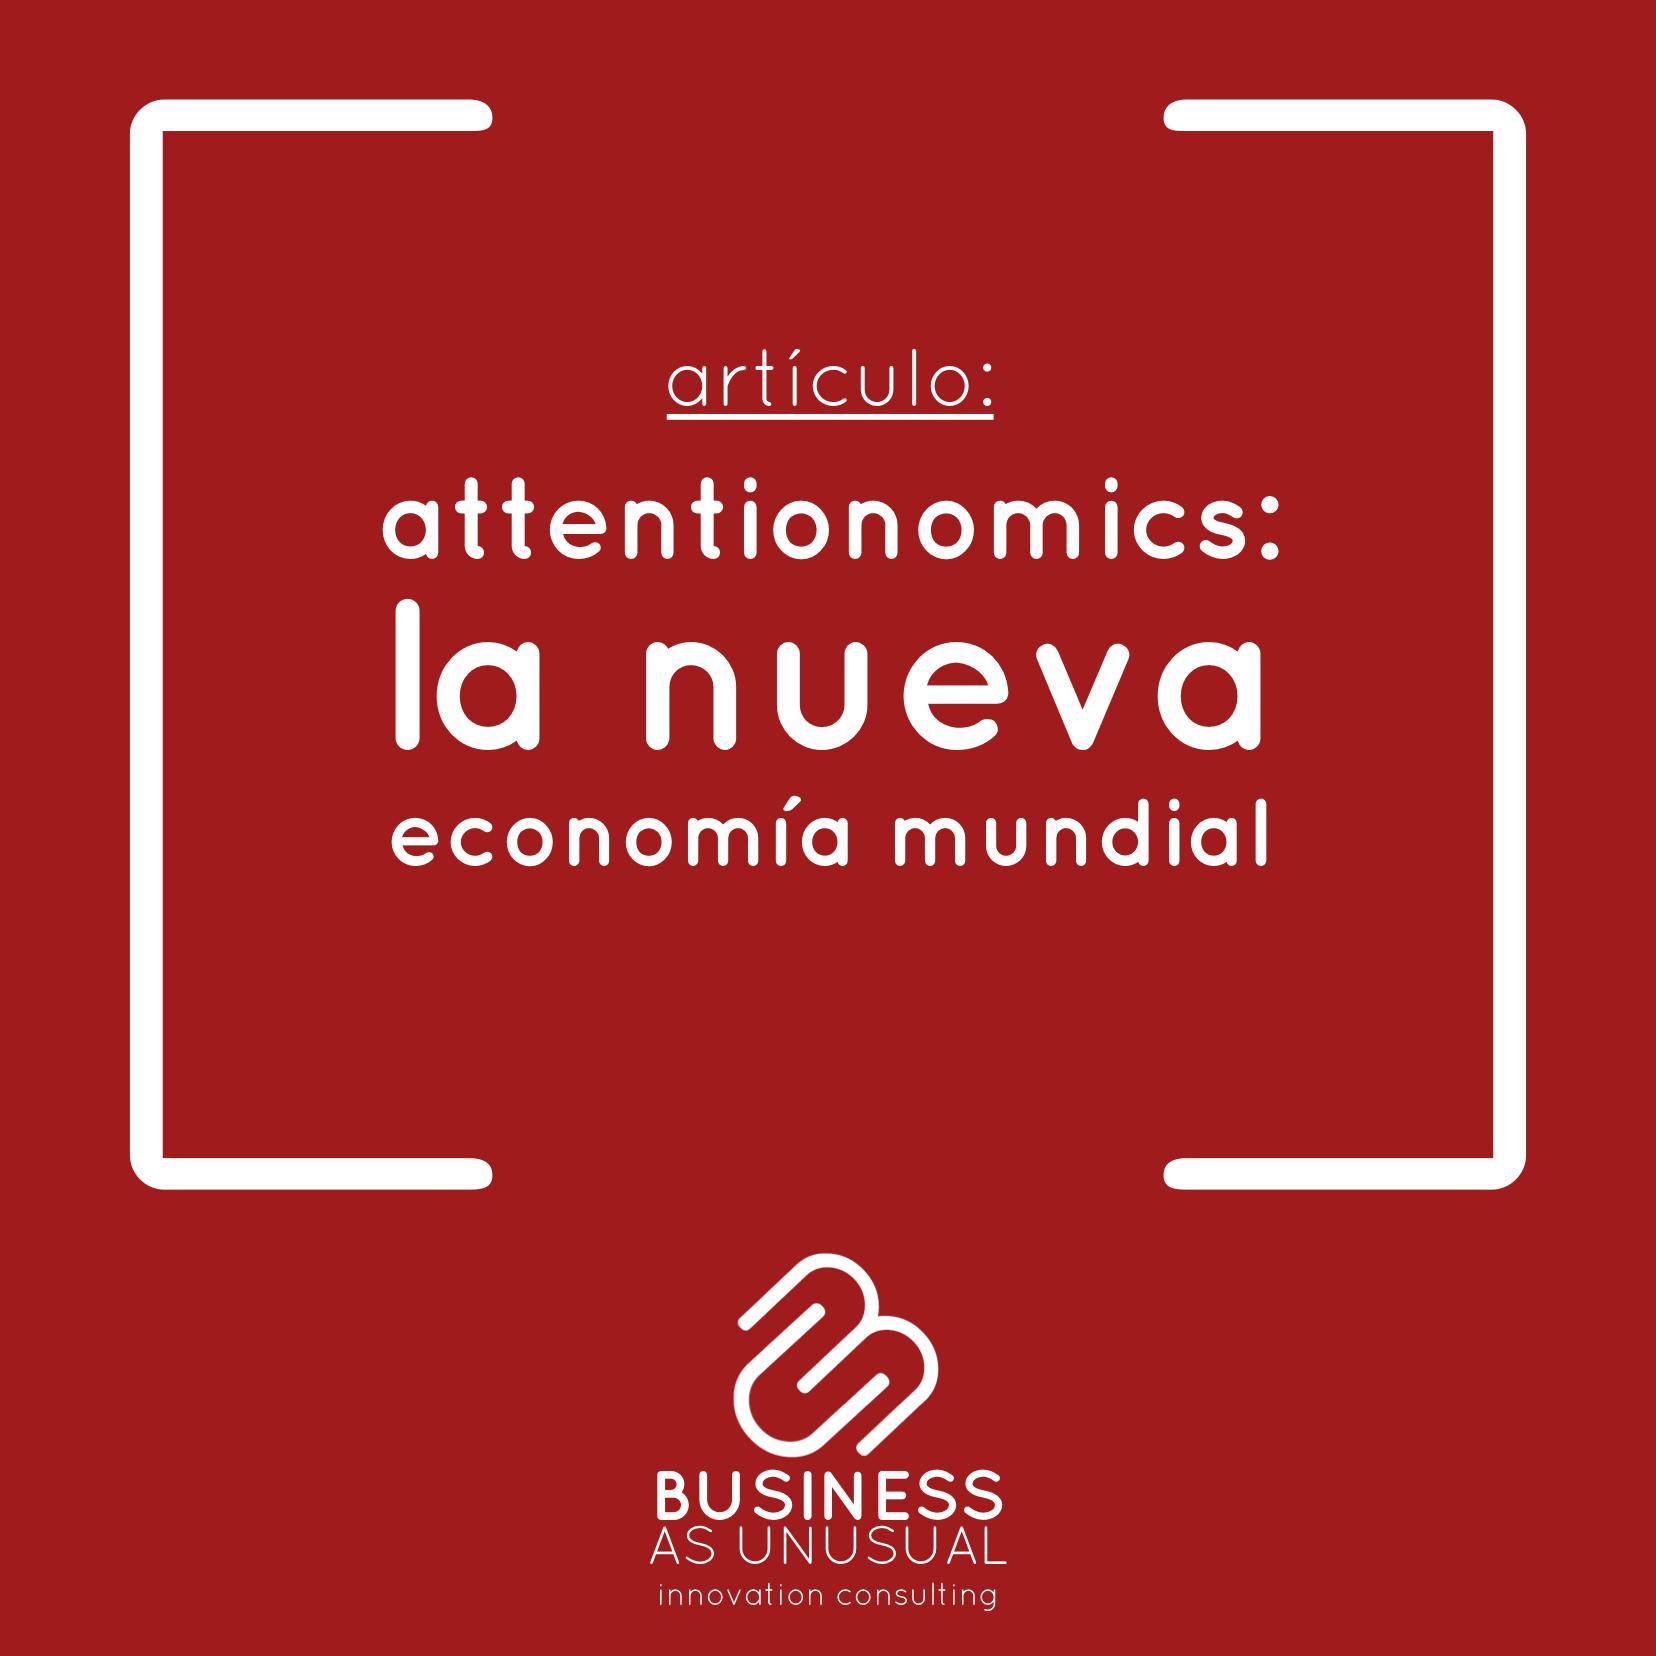 attentionomics: la nueva economía mundial